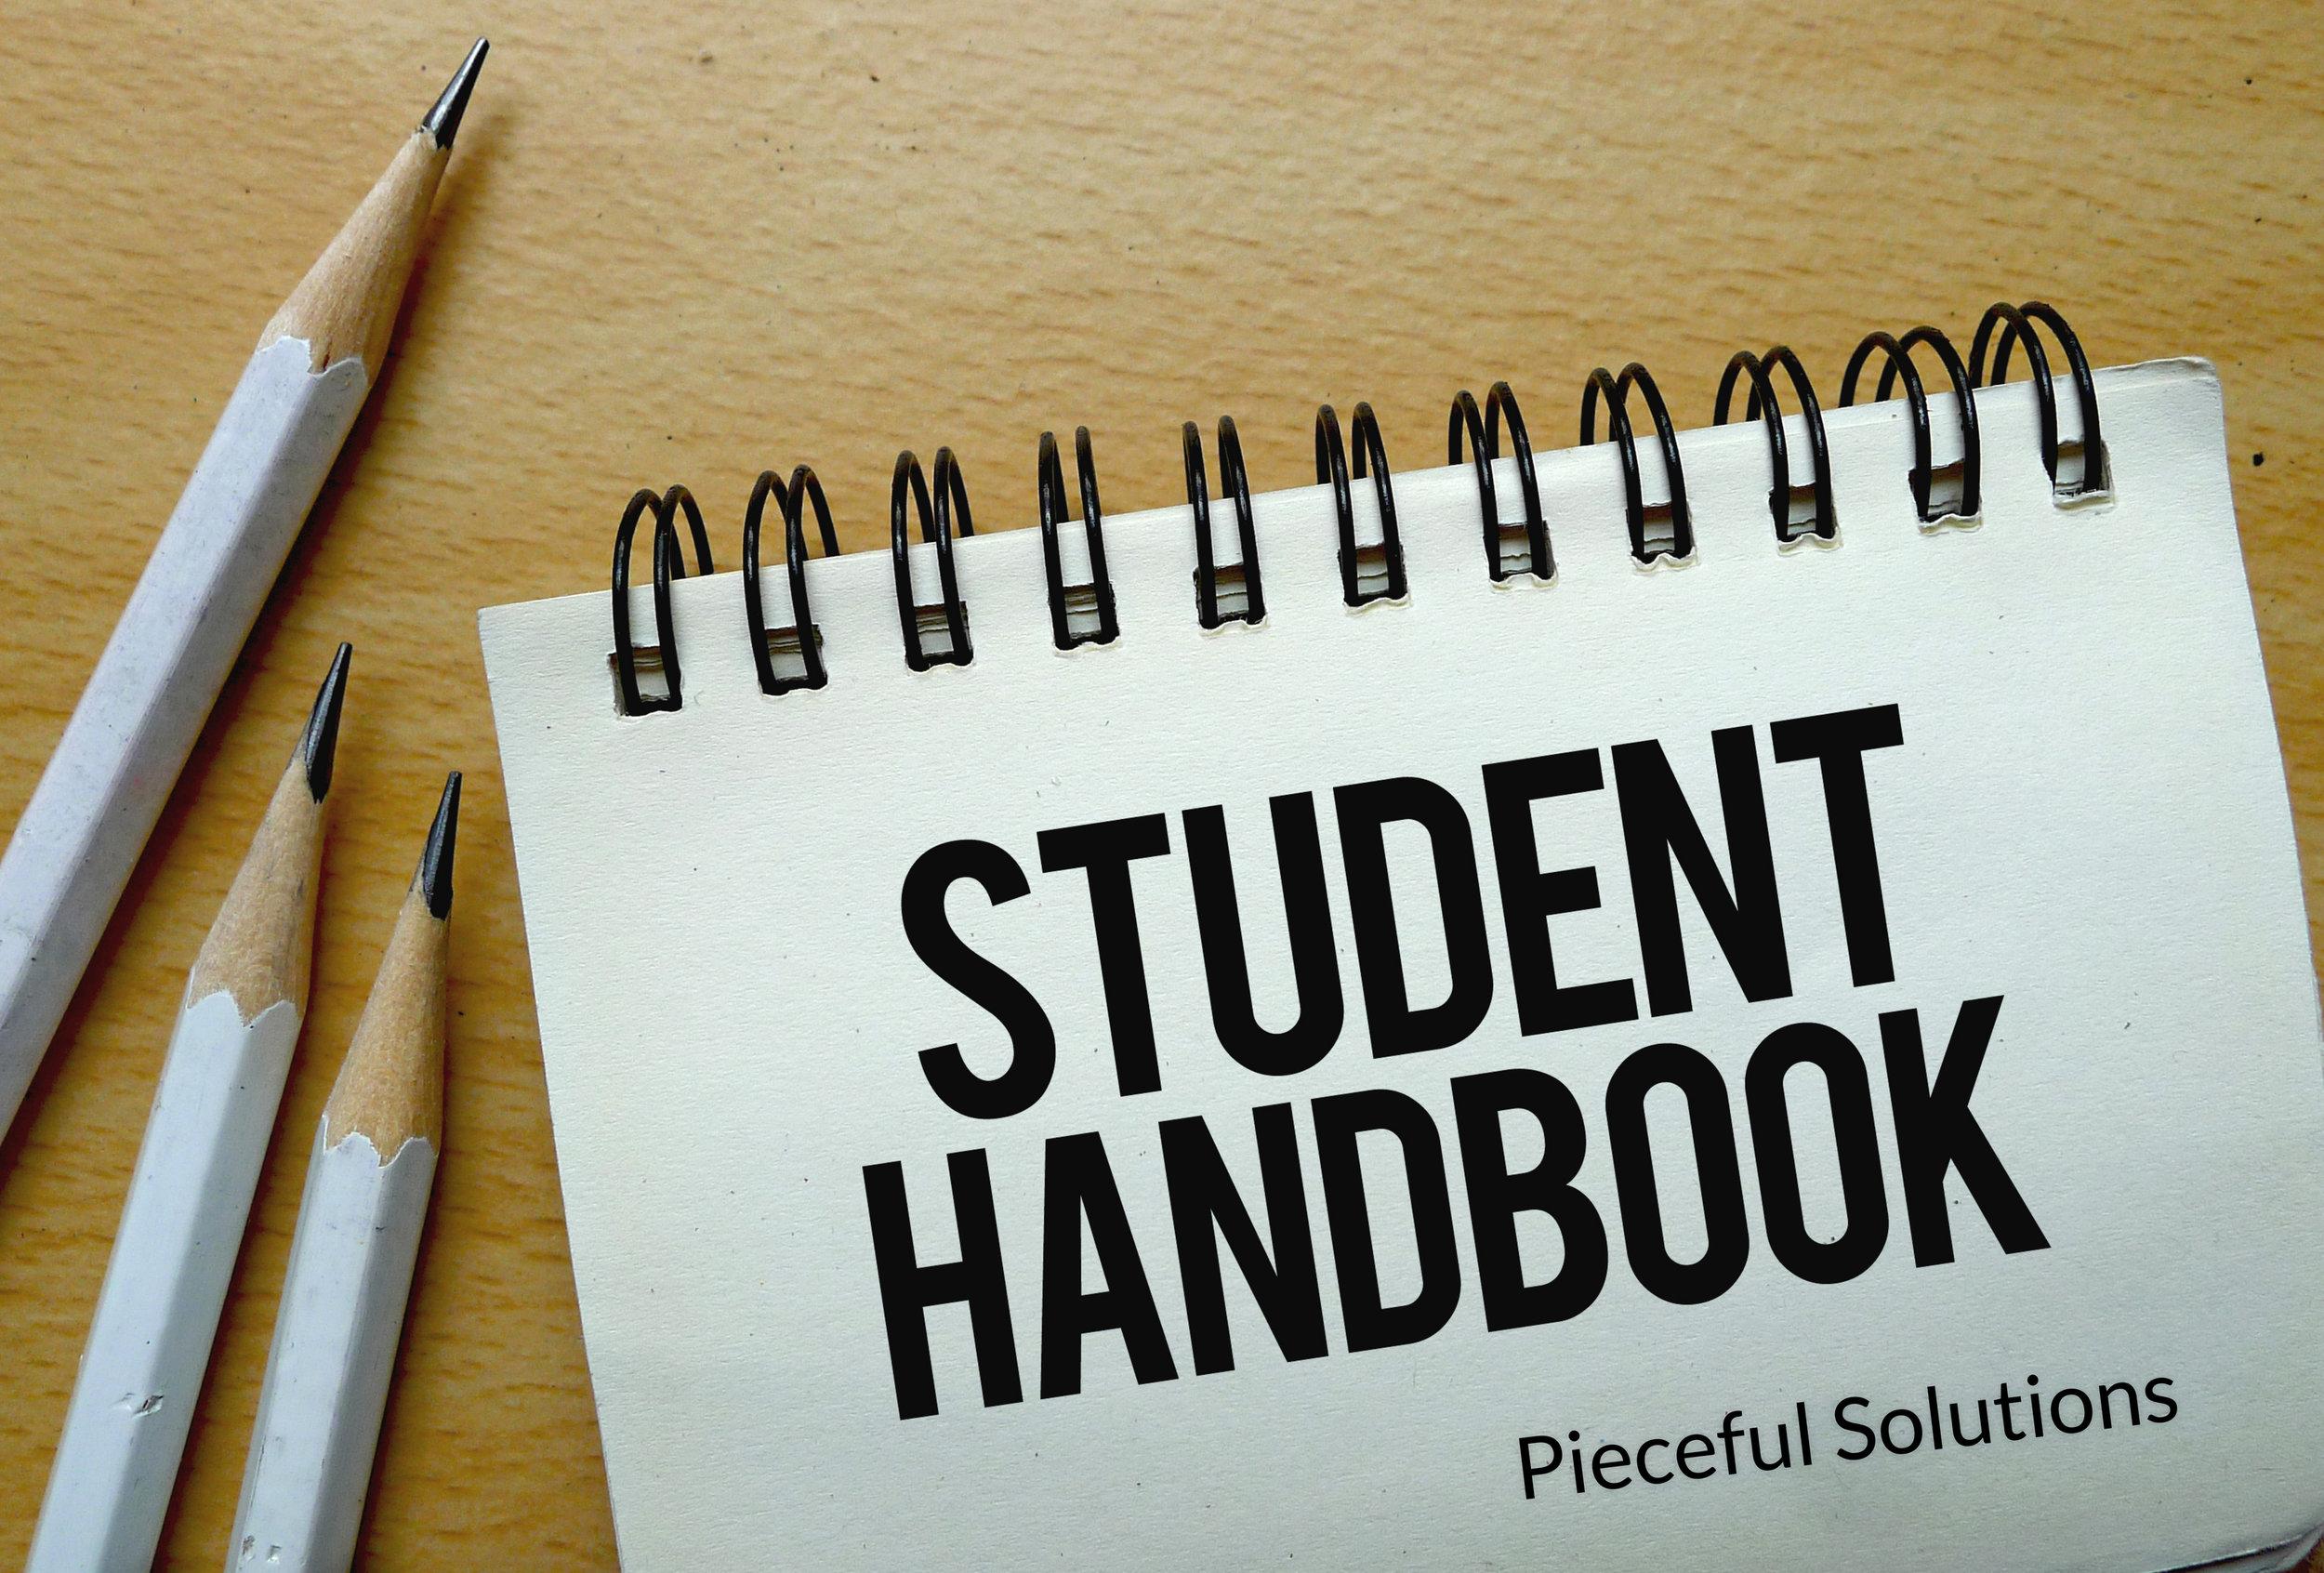 PS-Academy-Arizona-studenthandbookpic.jpg